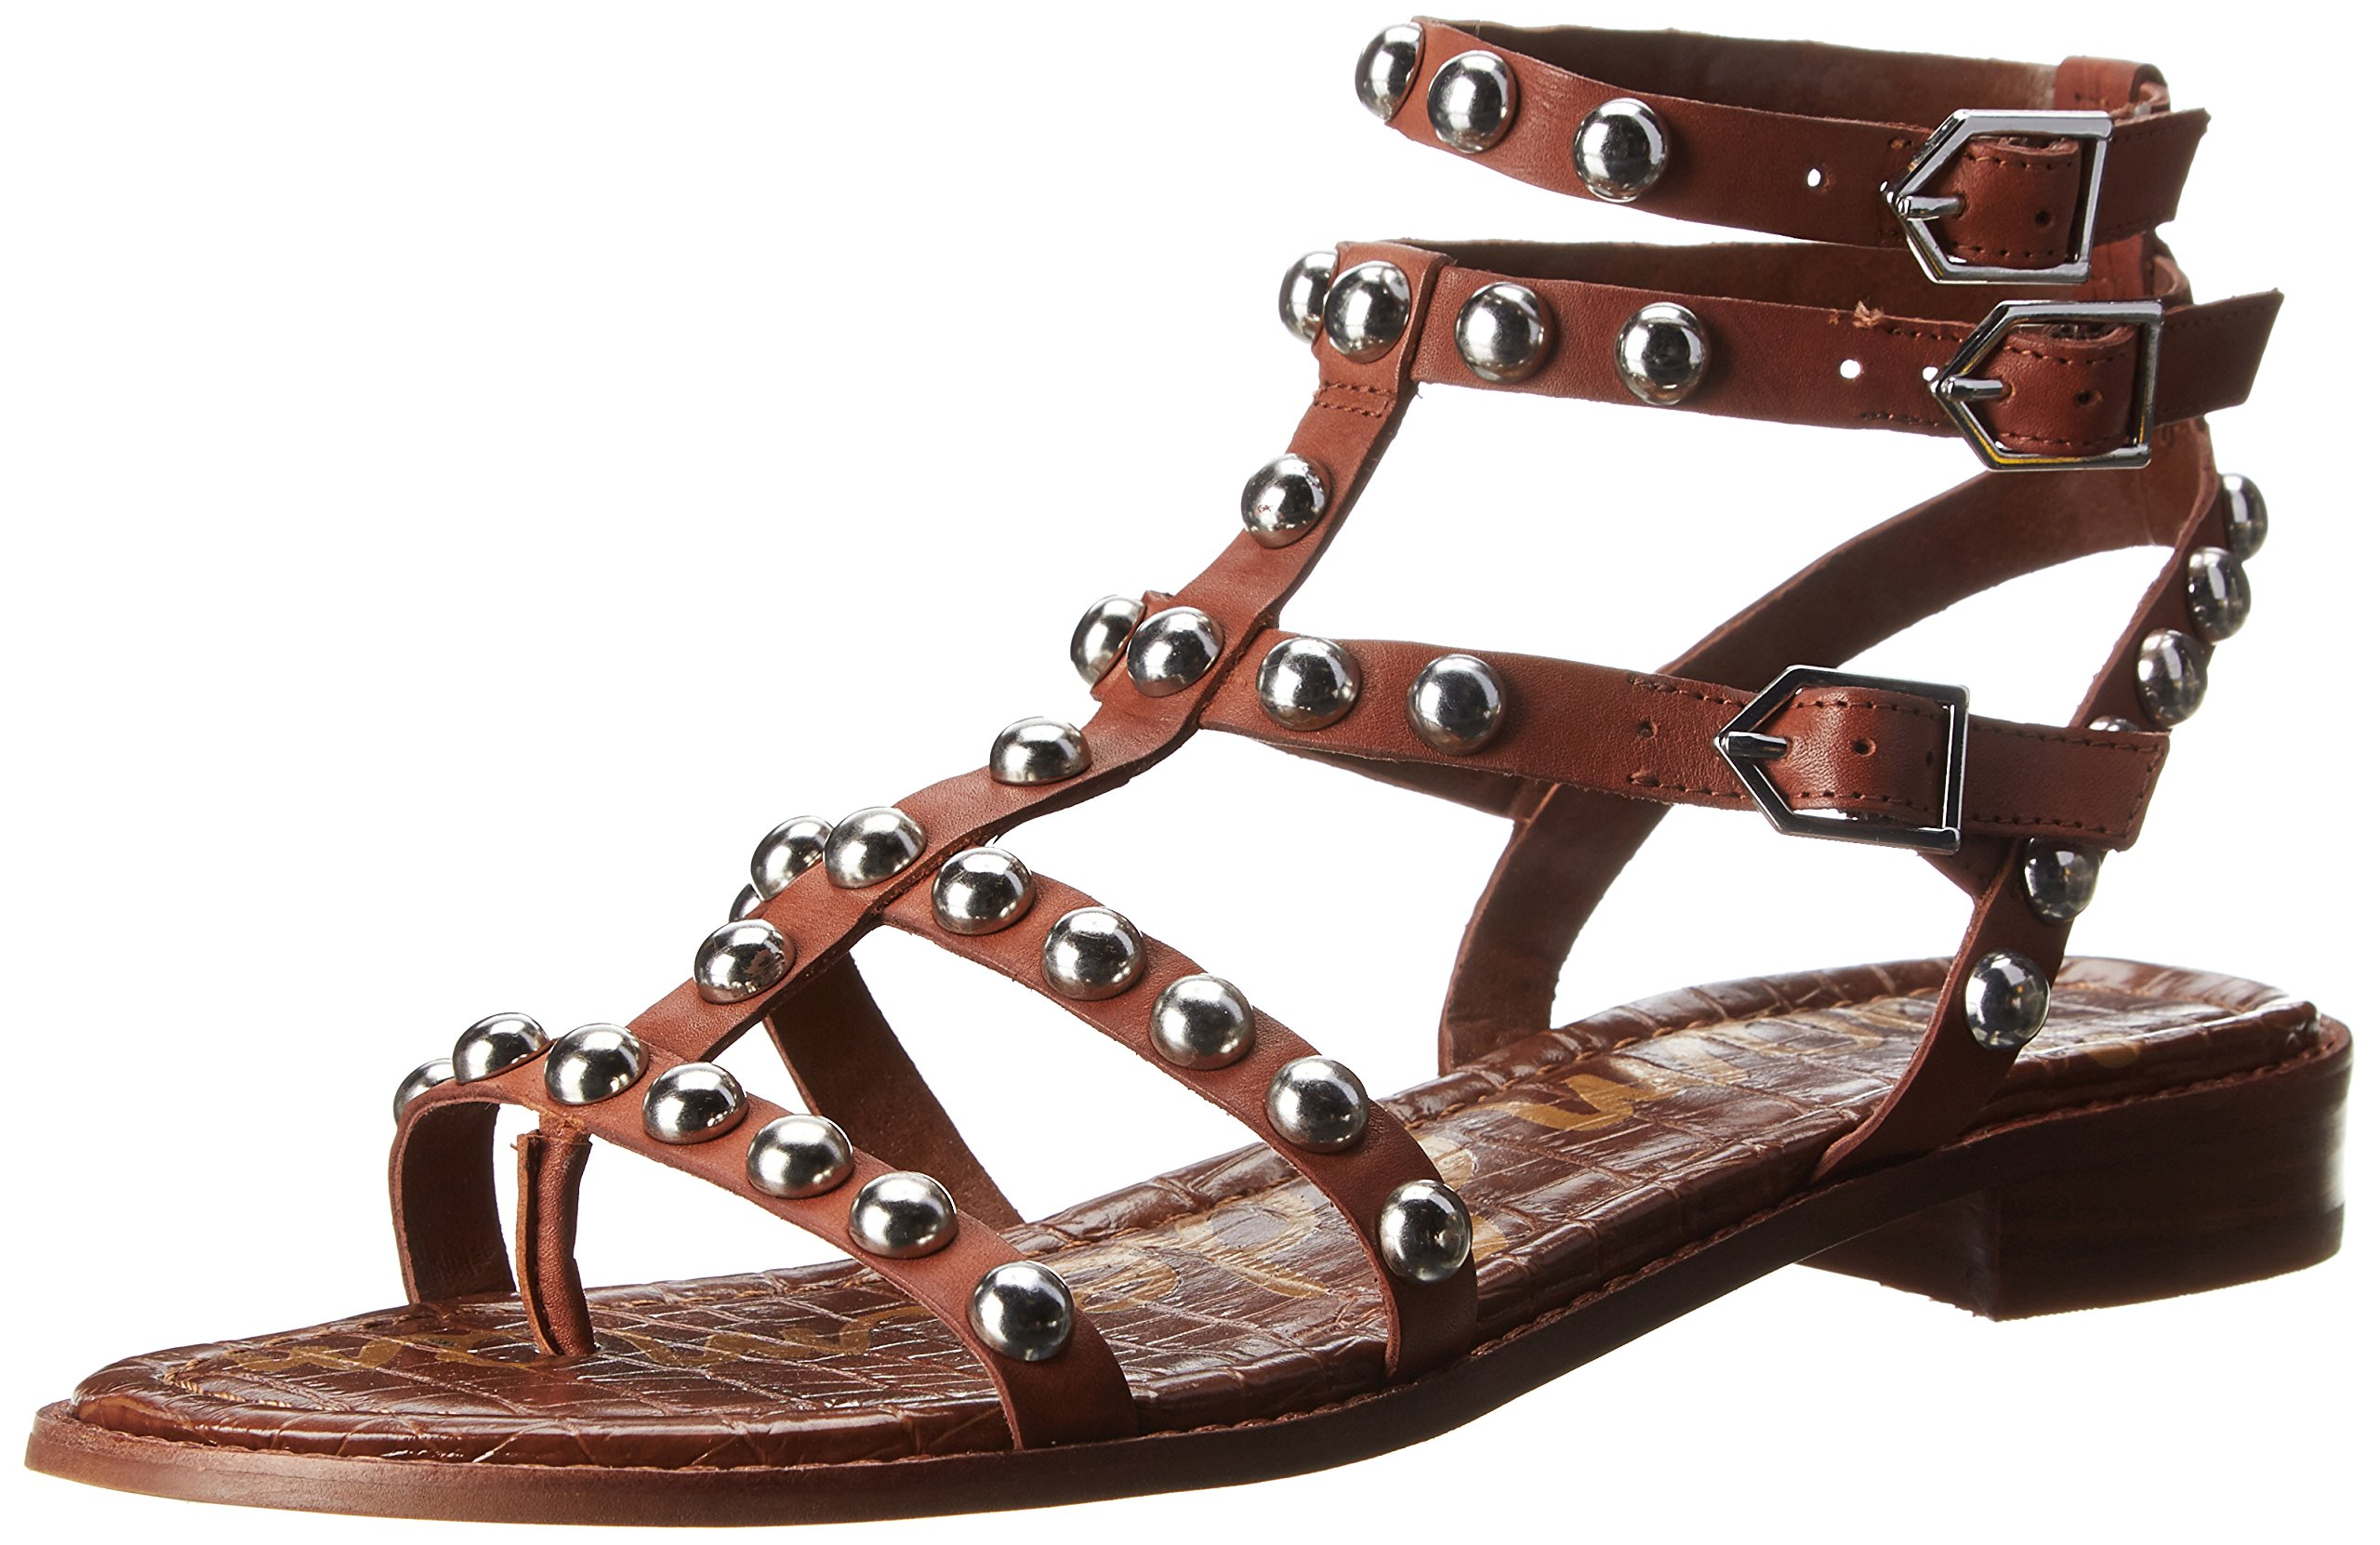 Sam Edelman Women's Eavan Gladiator Sandal, Deep Saddle, 6.5 M US by Sam Edelman